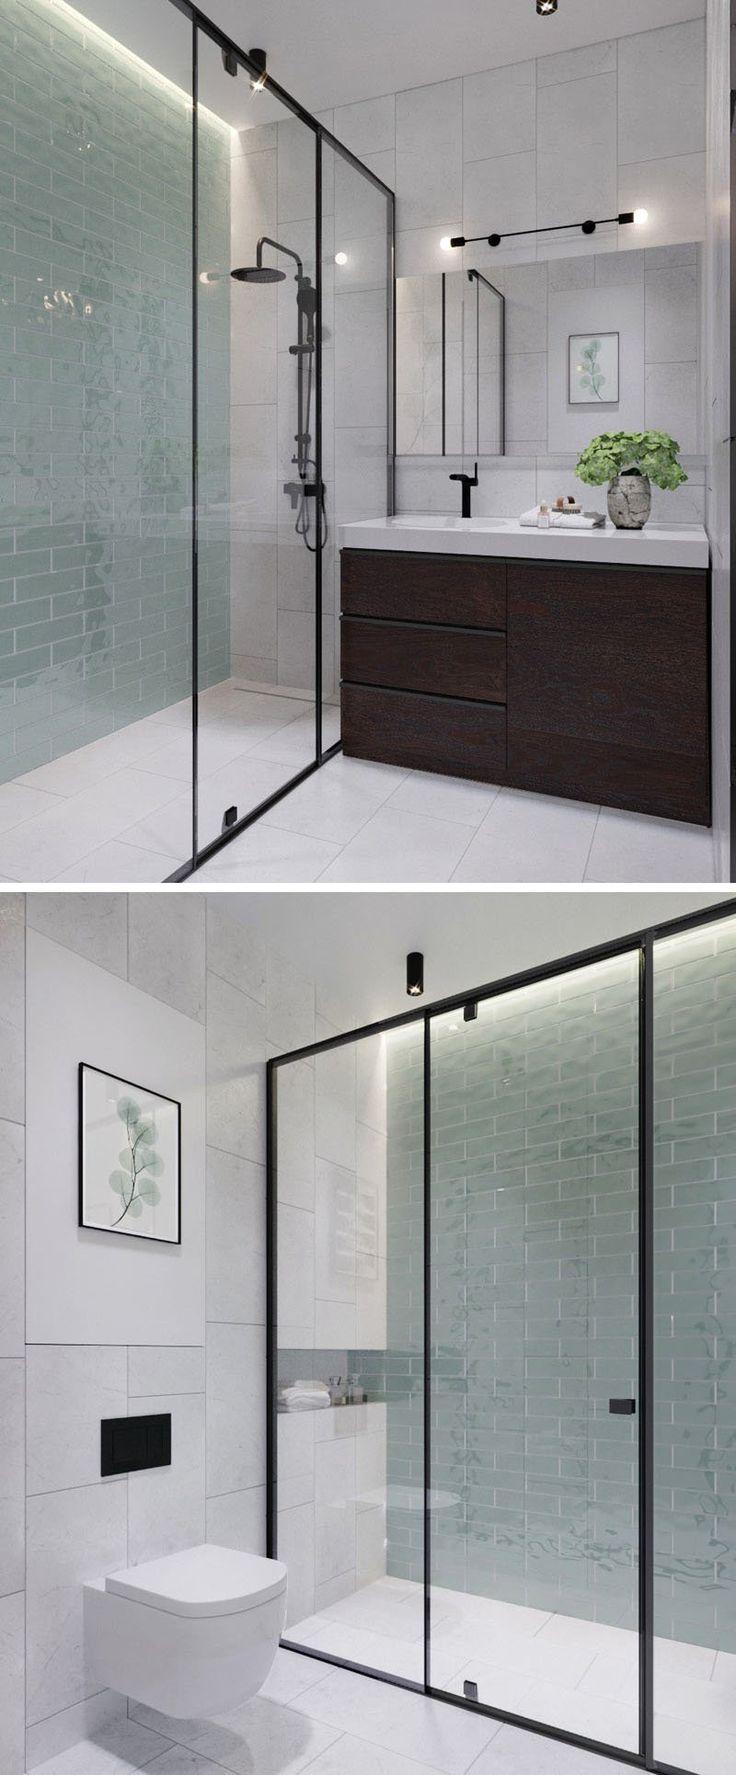 salle de bain mur bleu canard clemaroundthecorner.com